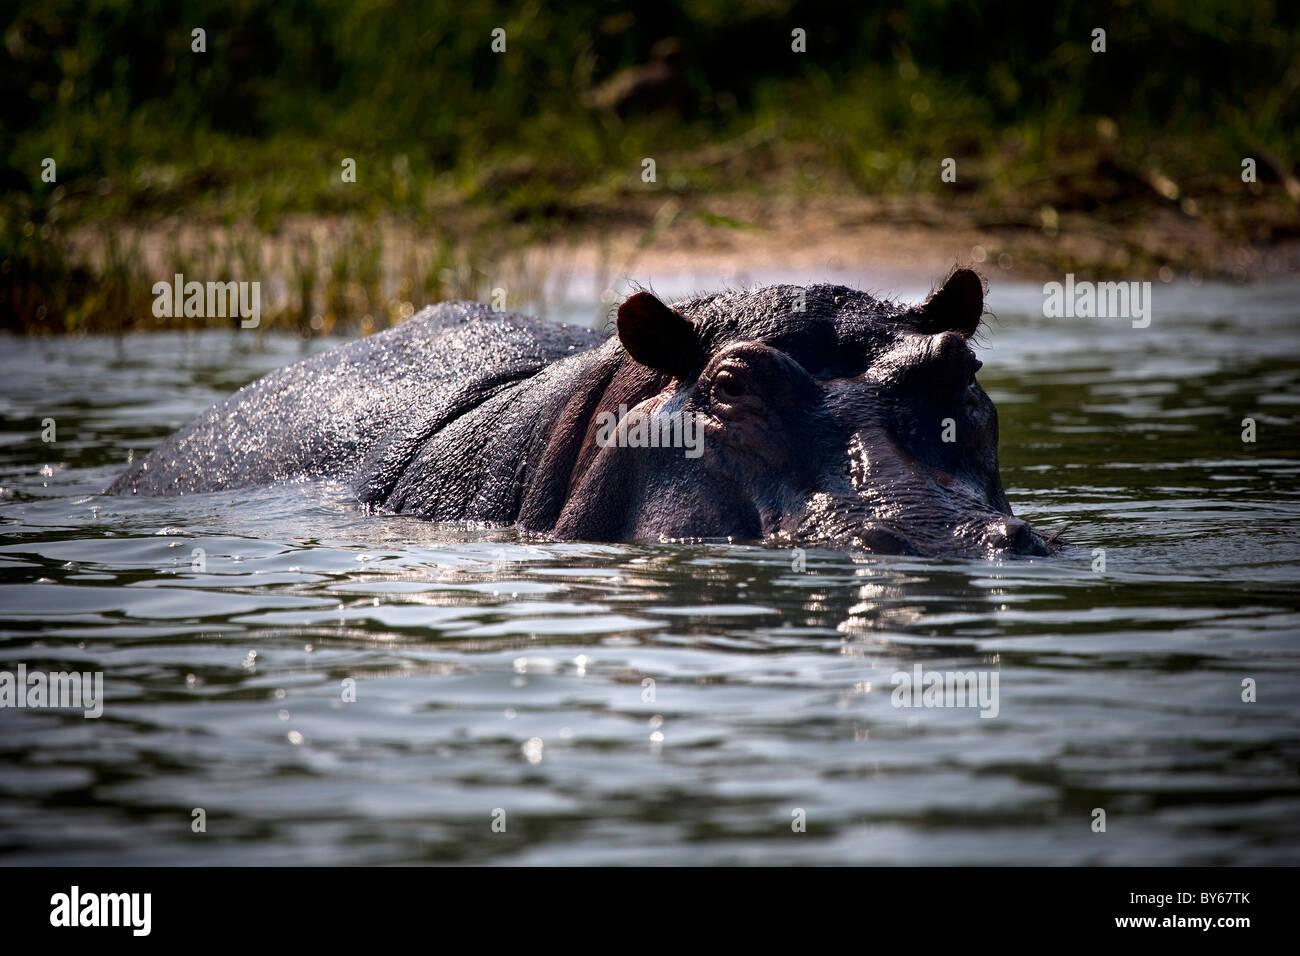 Hippopotamus, Kasinga Channel, Queen Elizabeth National Park, Uganda, East Africa - Stock Image